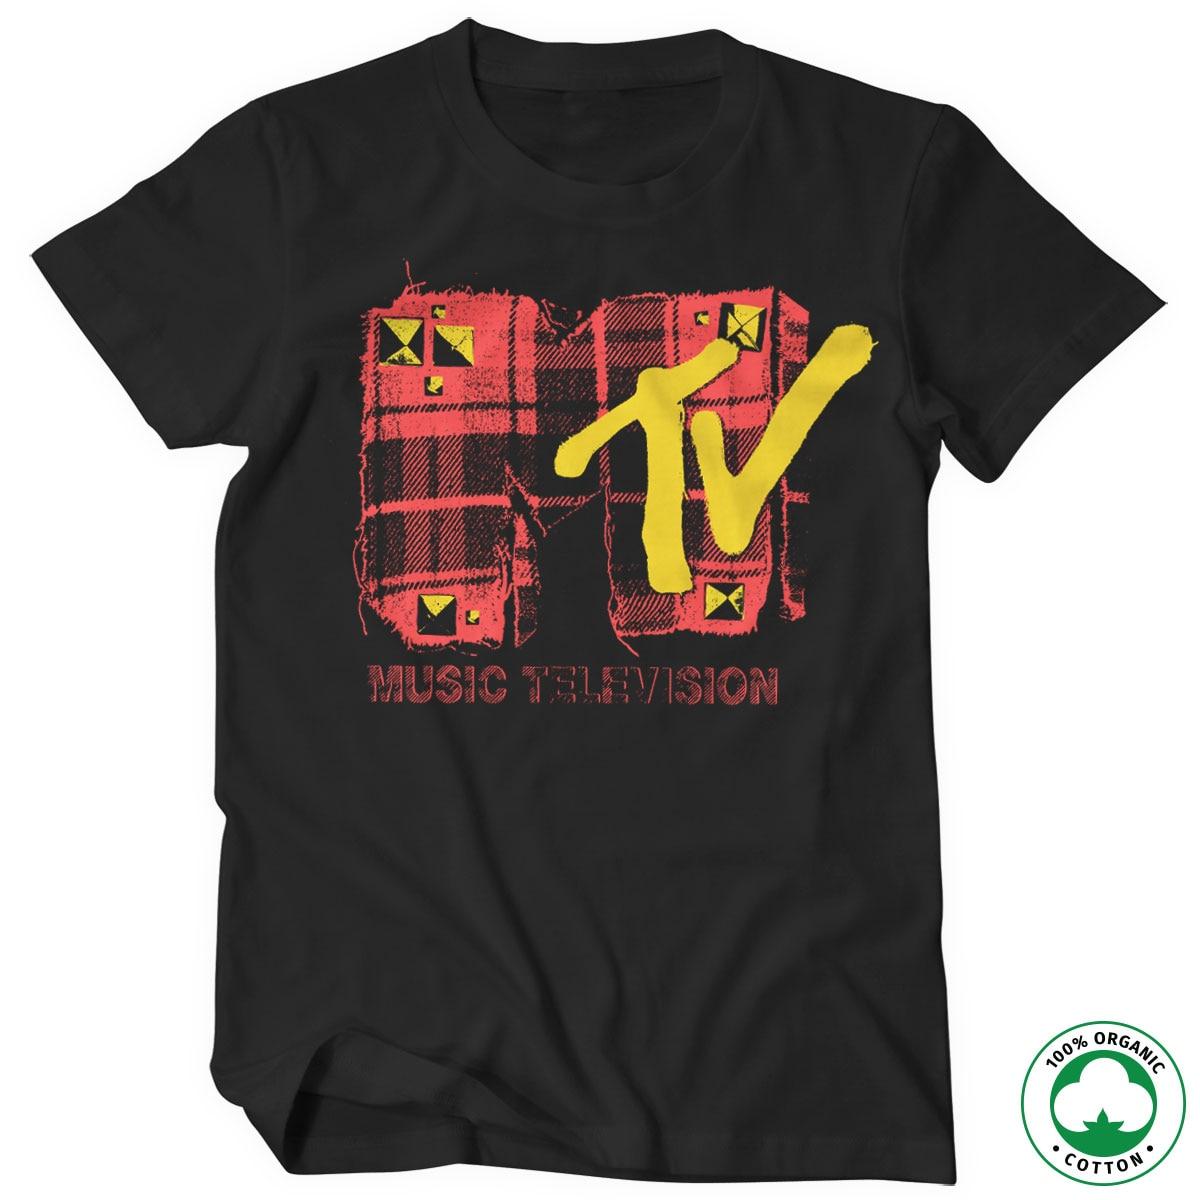 MTV-18-MTV004-BK